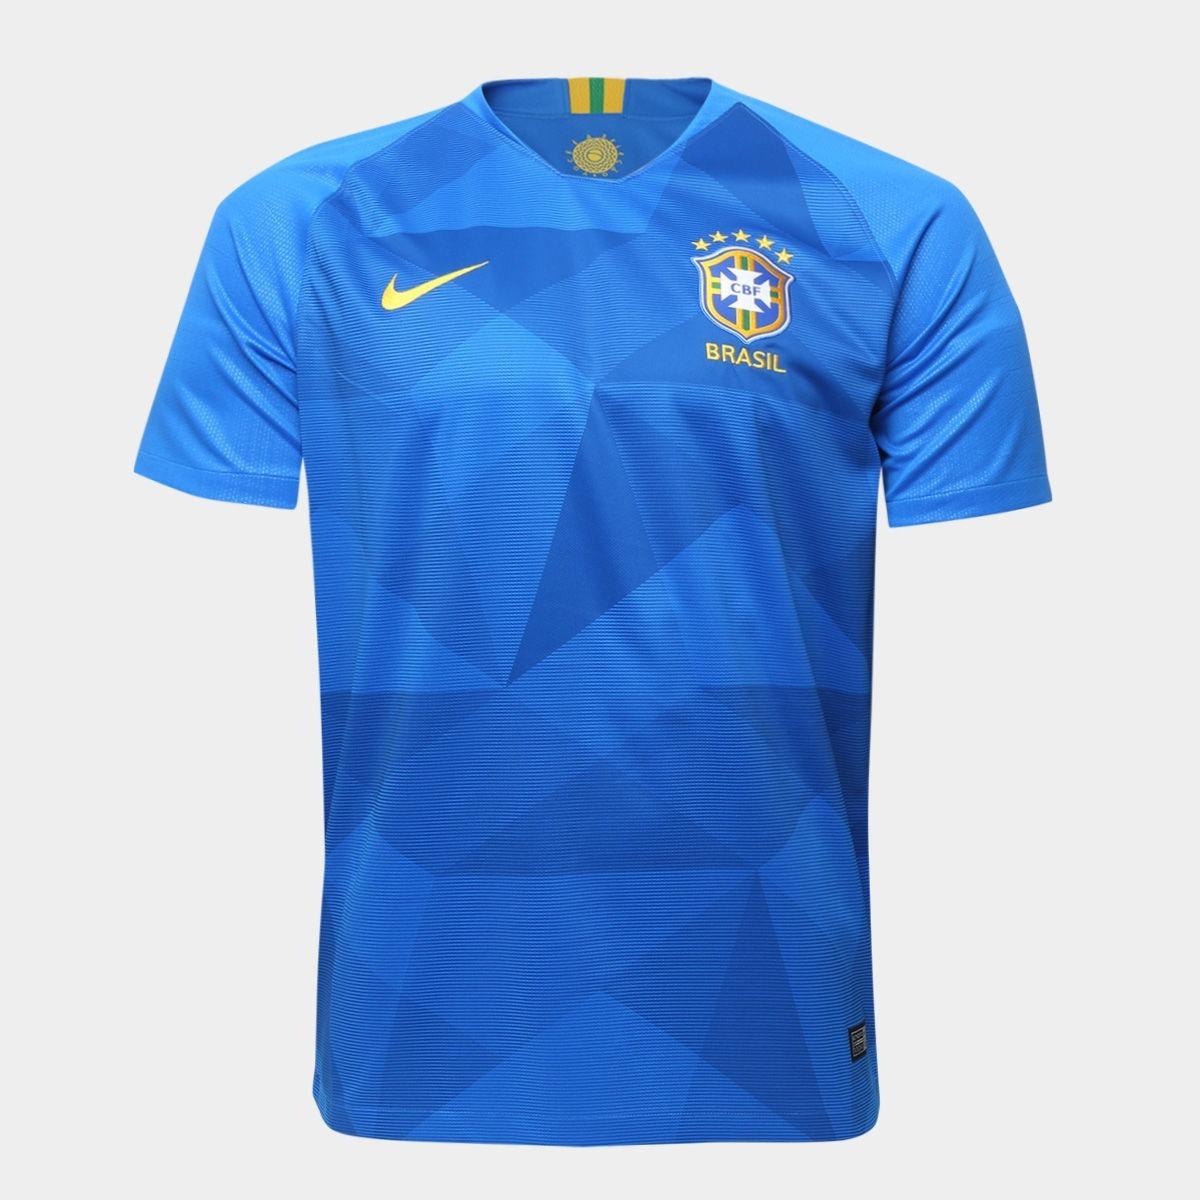 8d1b99f44e86c camisa seleção brasil ii 2018 s n° - torcedor nike masculina. Carregando  zoom.